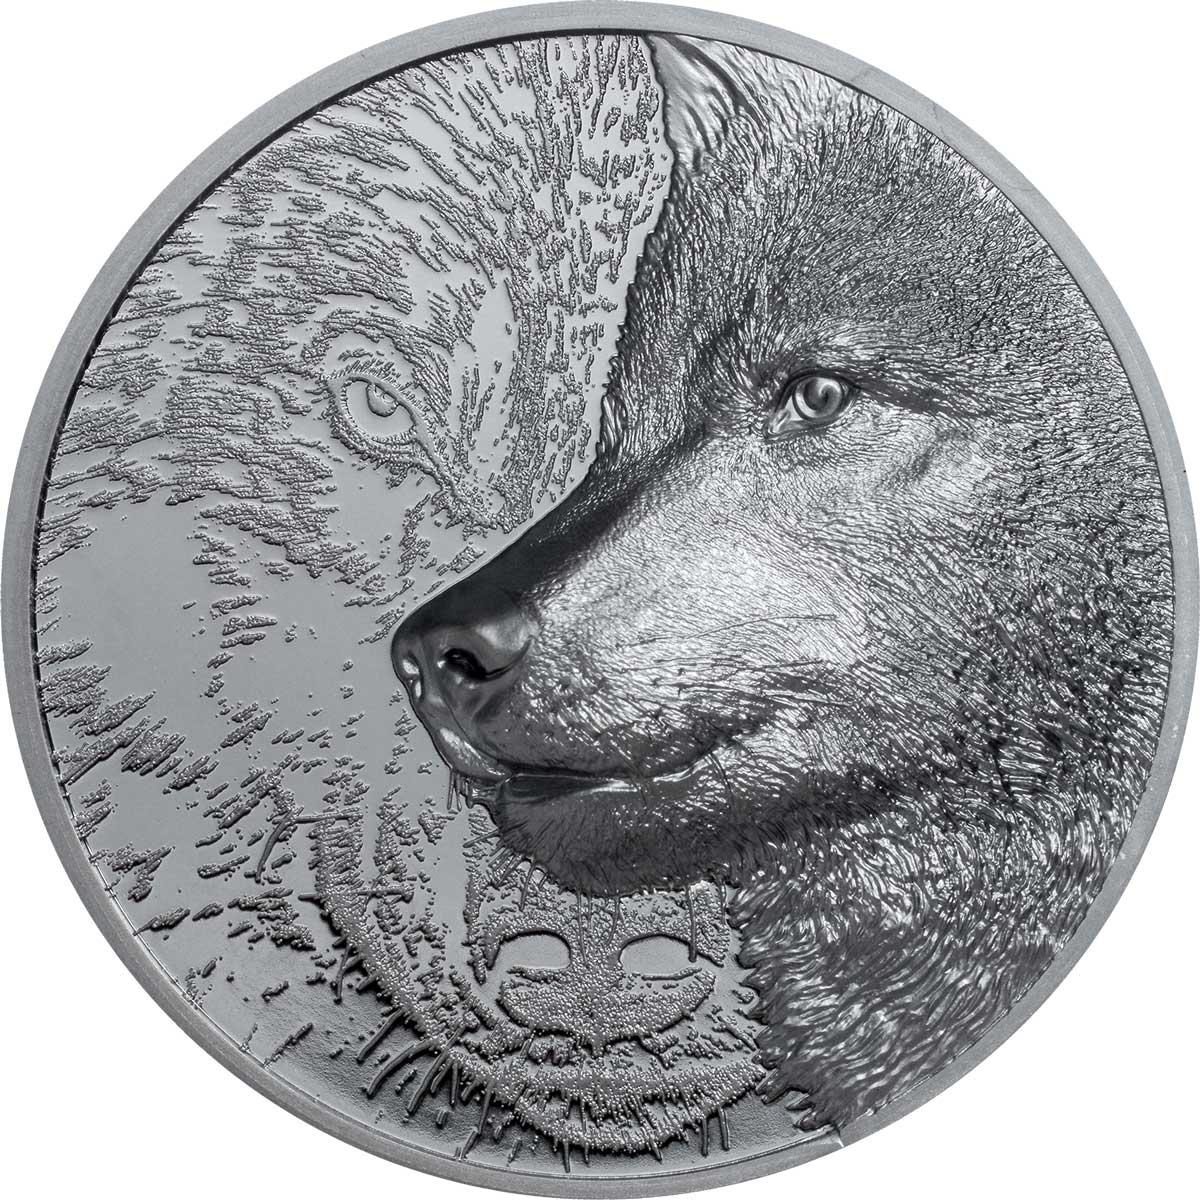 Монголия монета 1 000 тугриков Мистический Волк, реверс